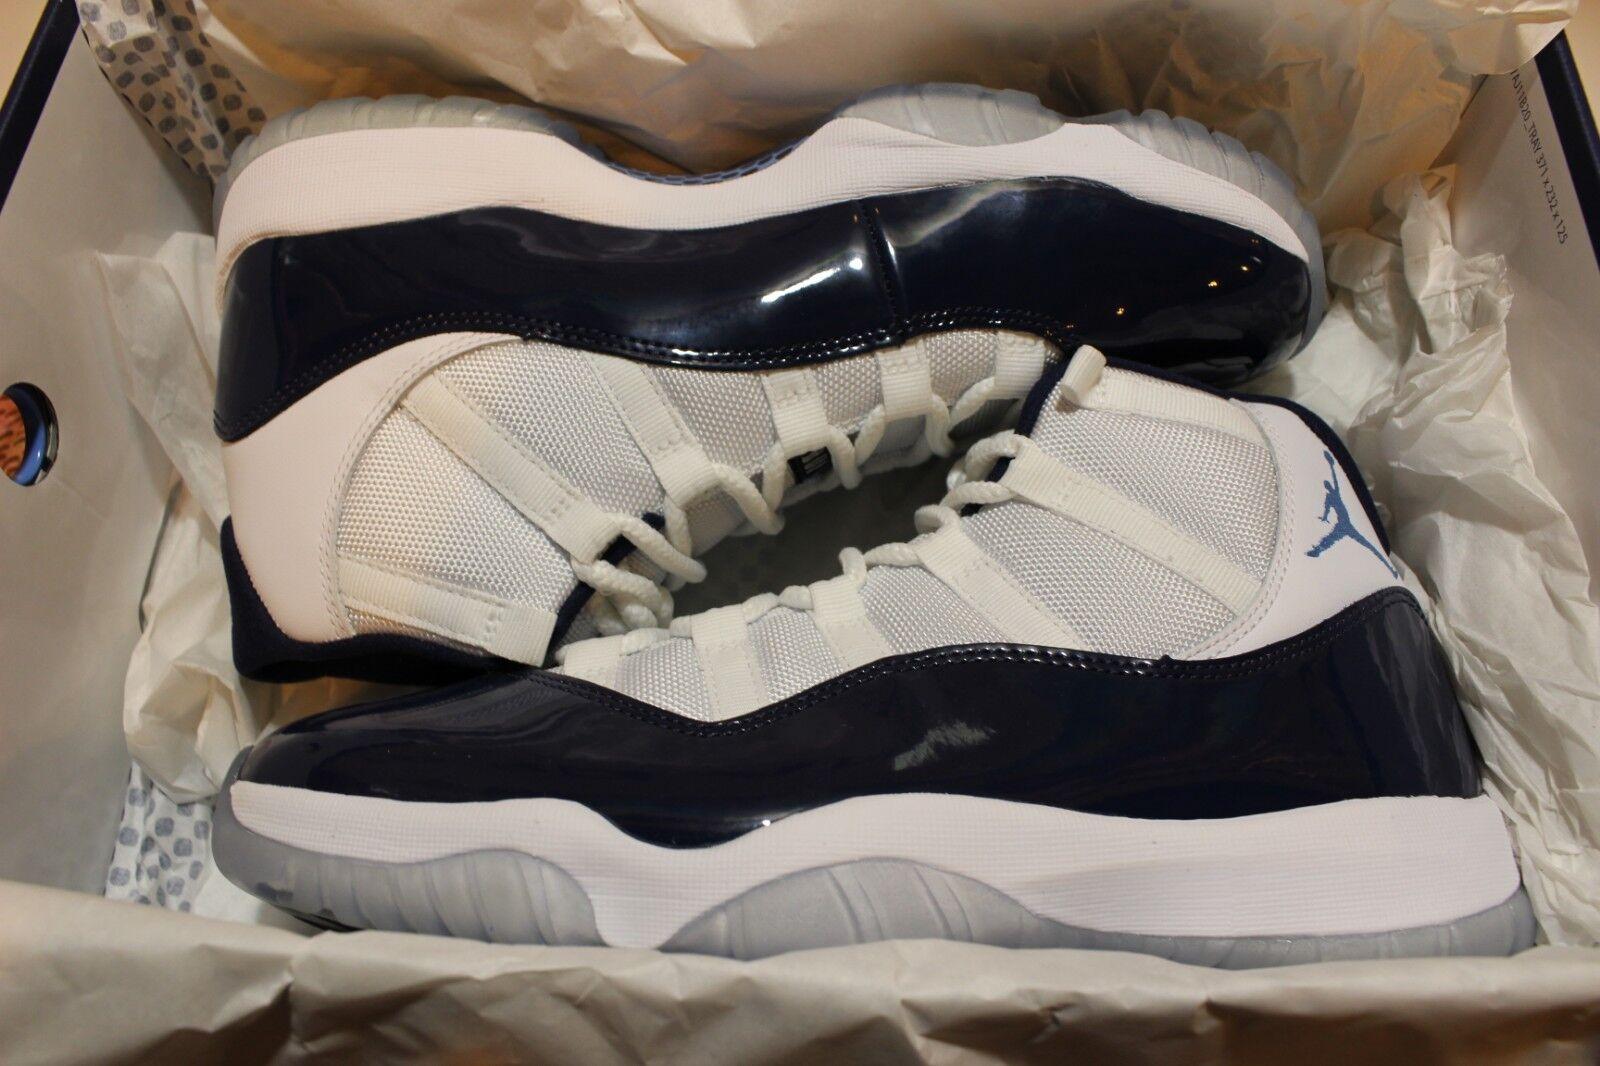 Nike Jordan Retro 378037-123, 11